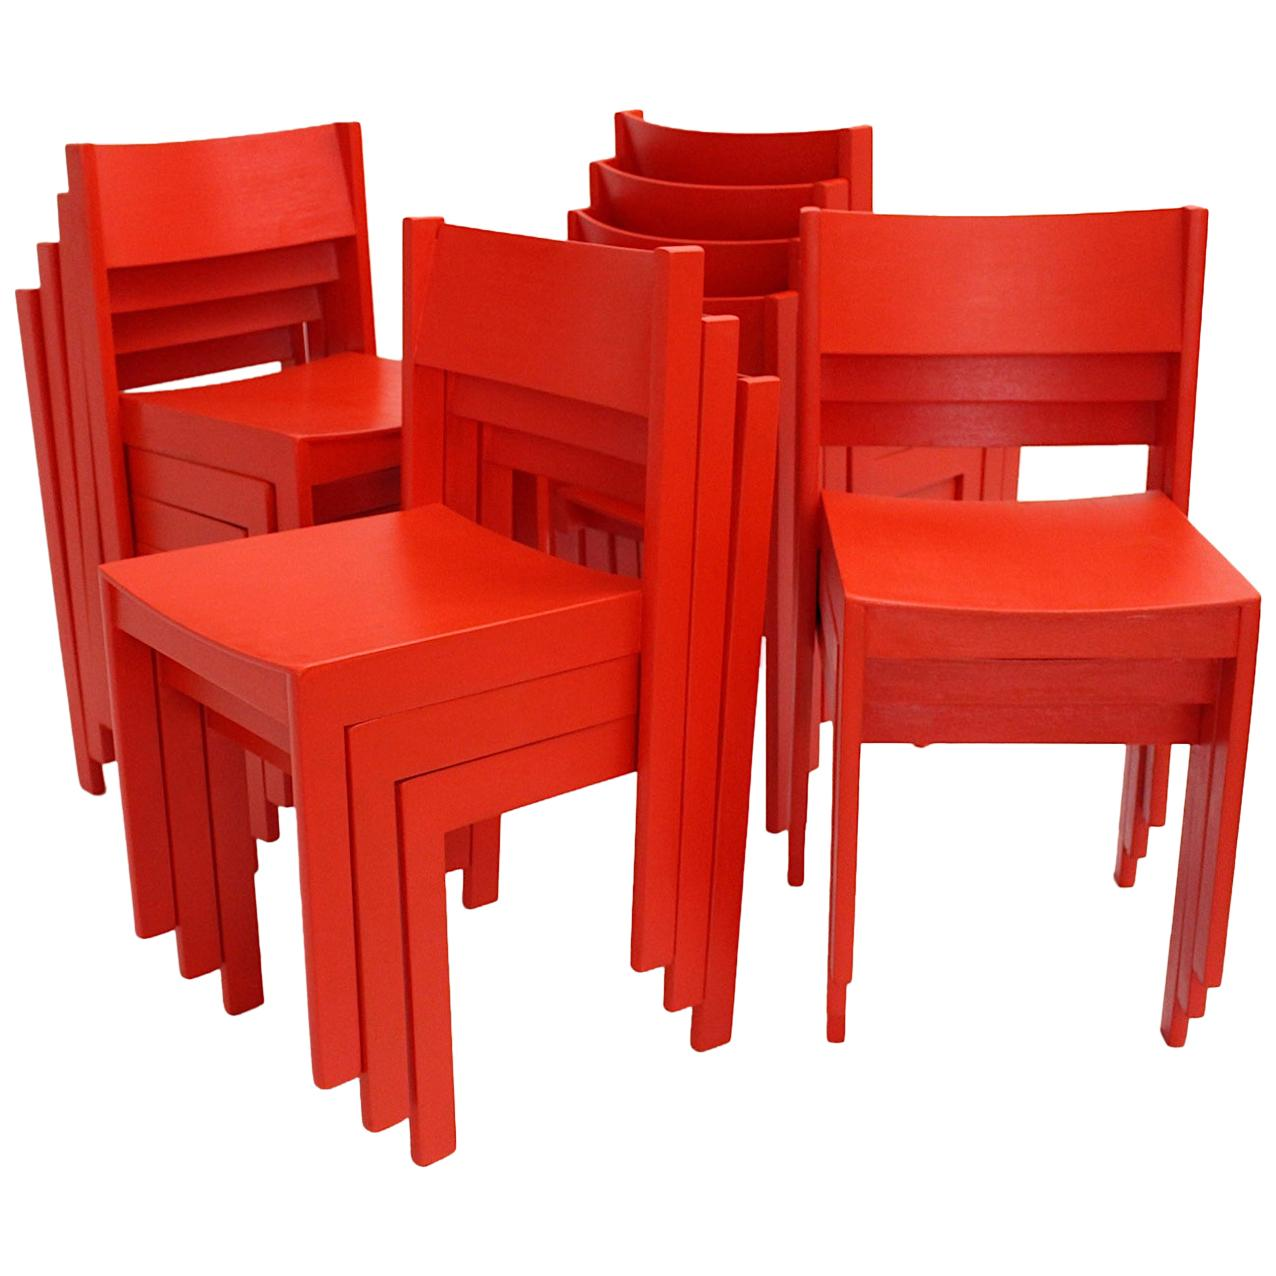 Mid-Century Modern Vintage Red Beech Dining Room Chairs 1950s Vienna Austria